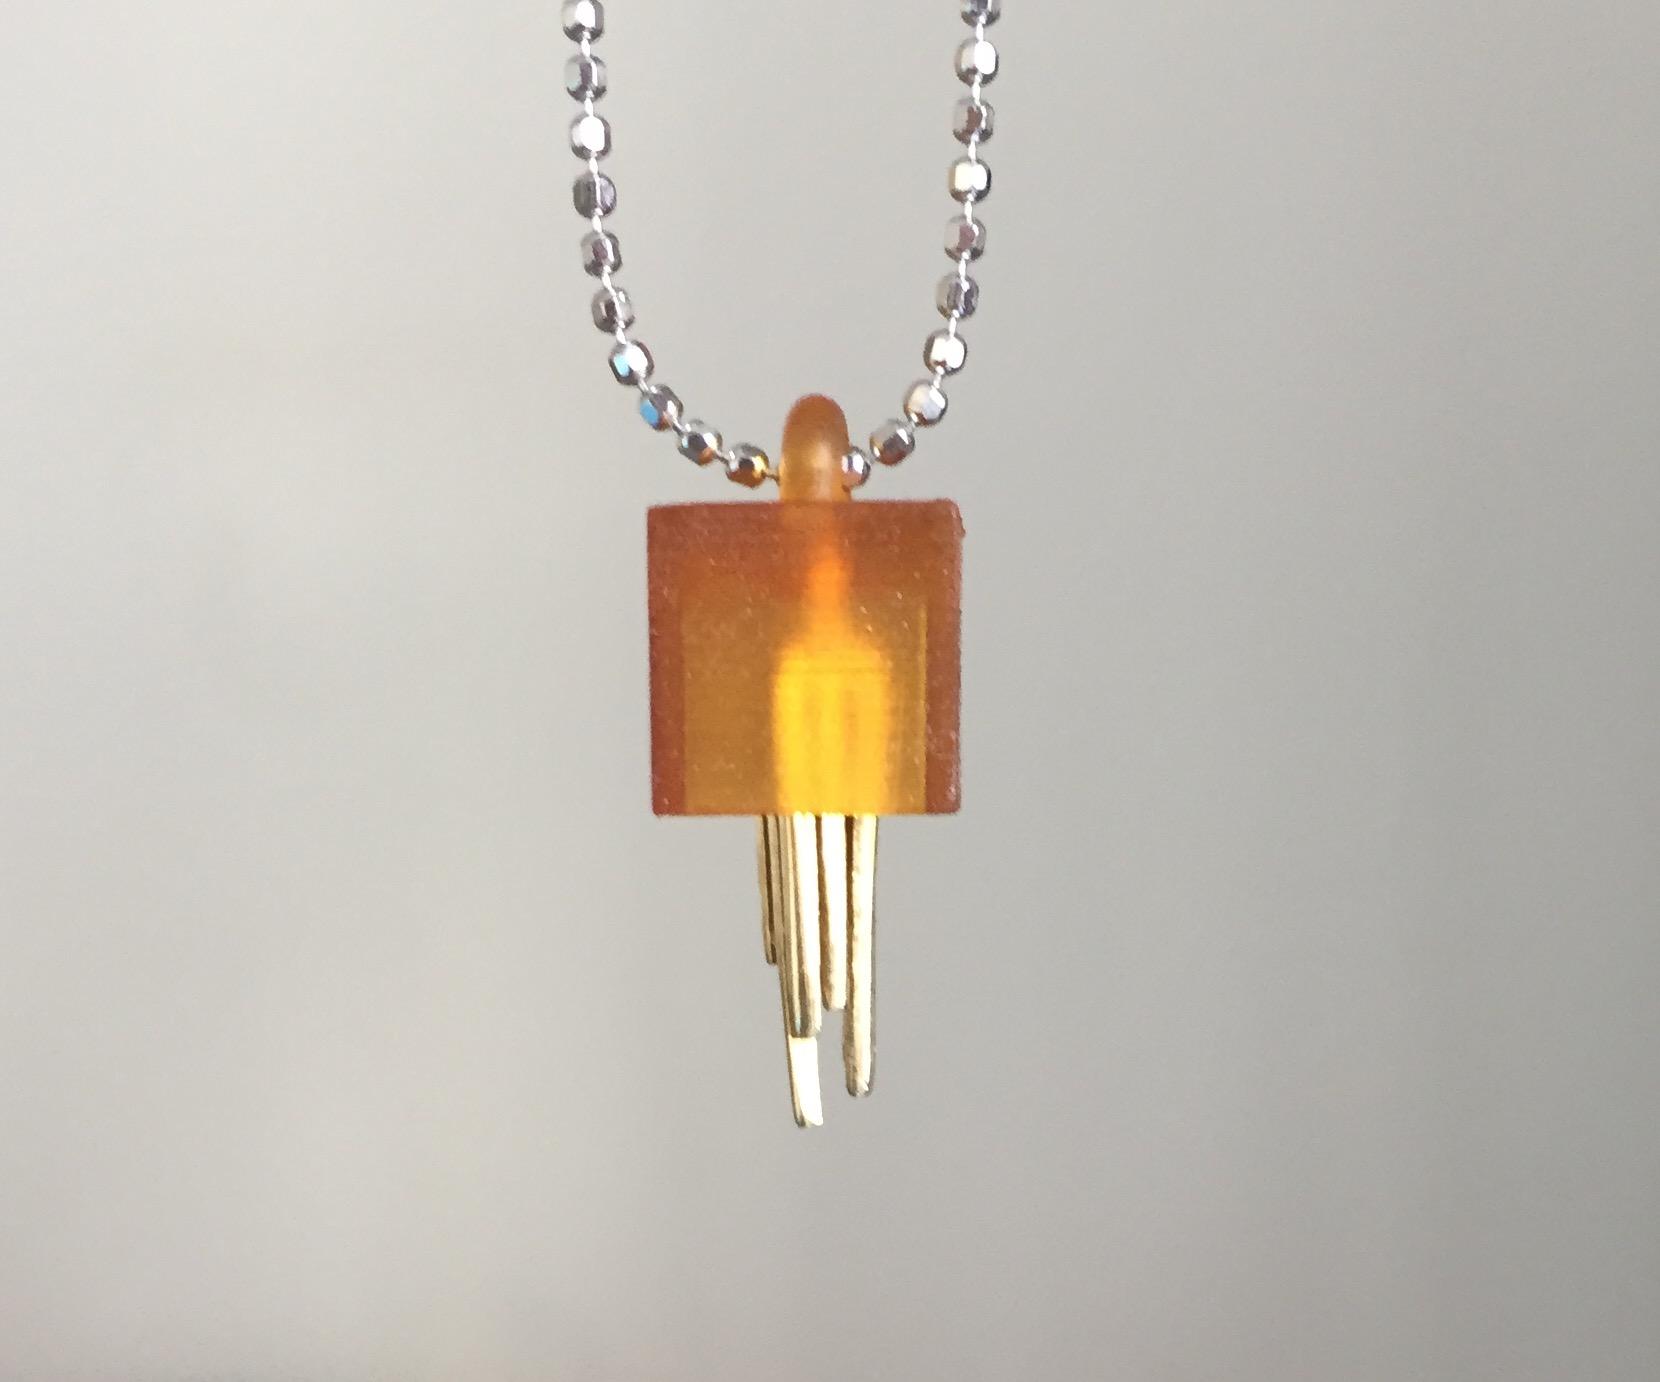 sculpteo_cyes_necklace